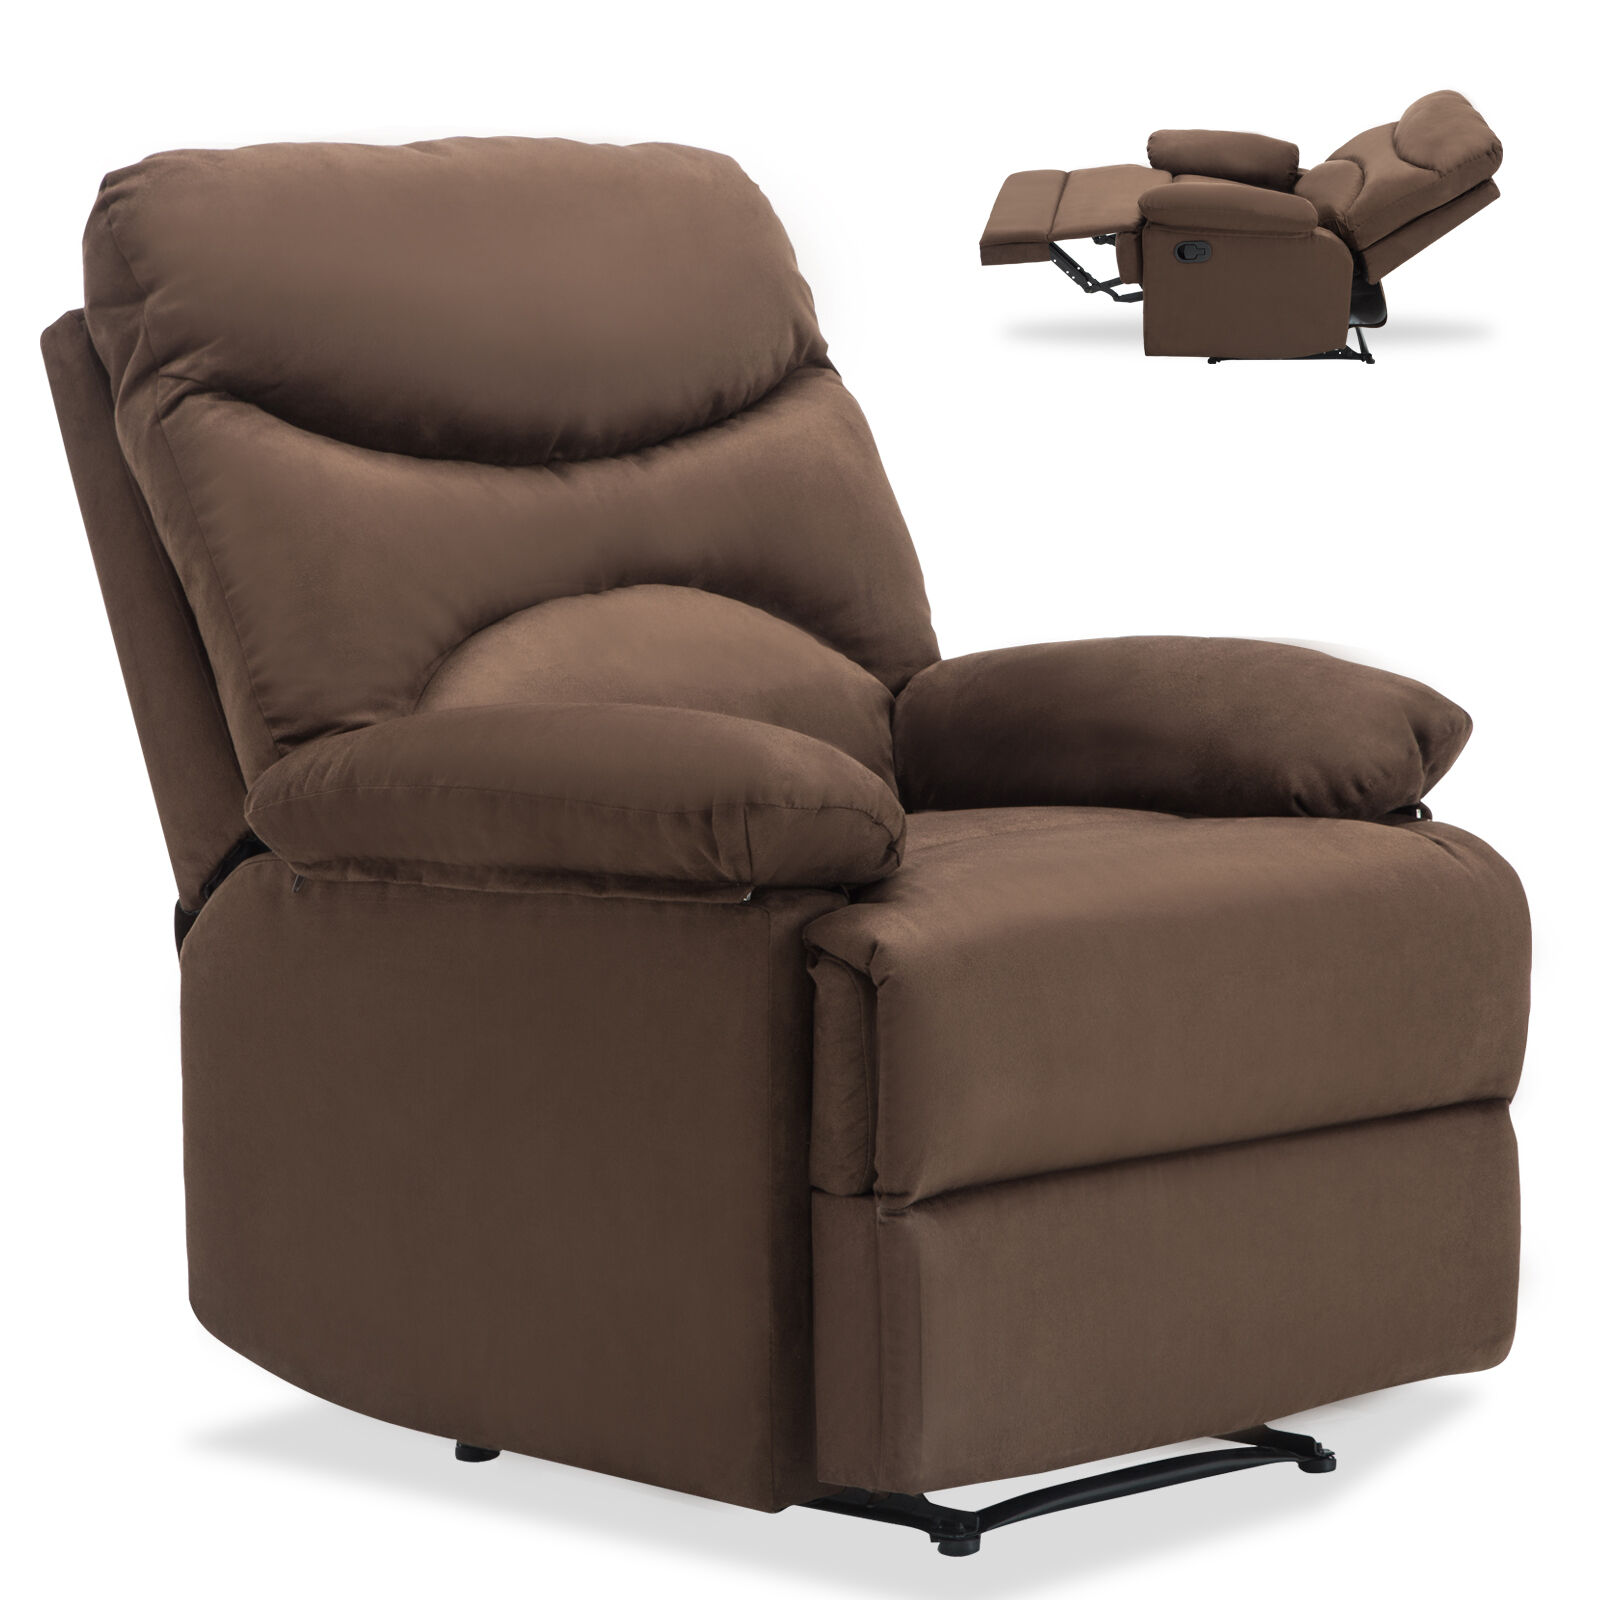 Beau Microfiber Massage Recliner Sofa Chair Ergonomic Lounge Swivel Heated  W/Control